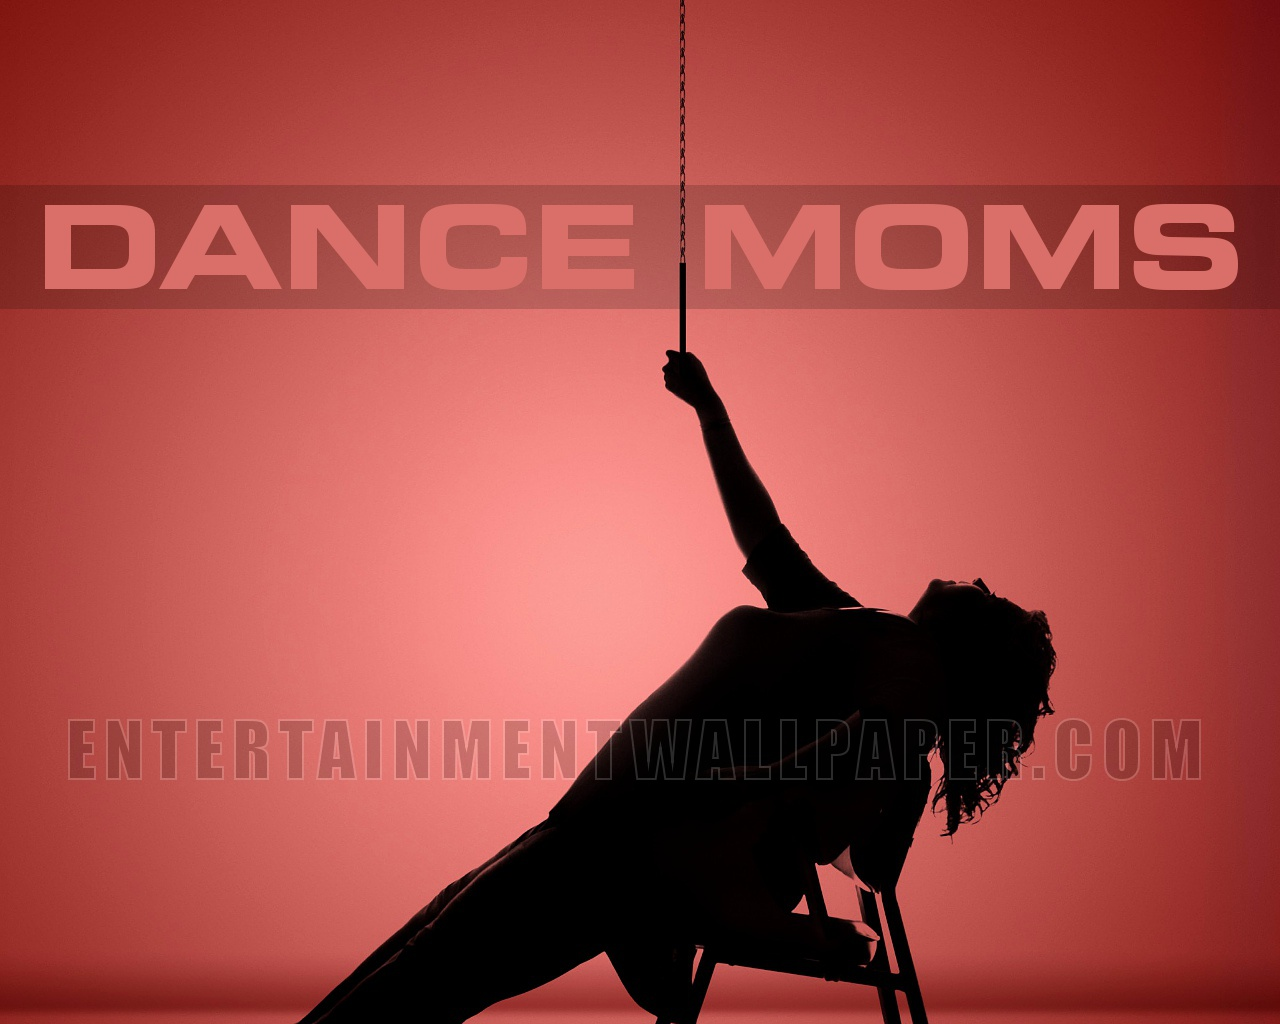 dance moms wallpaper 20036672 size 1280x1024 more dance moms wallpaper 1280x1024